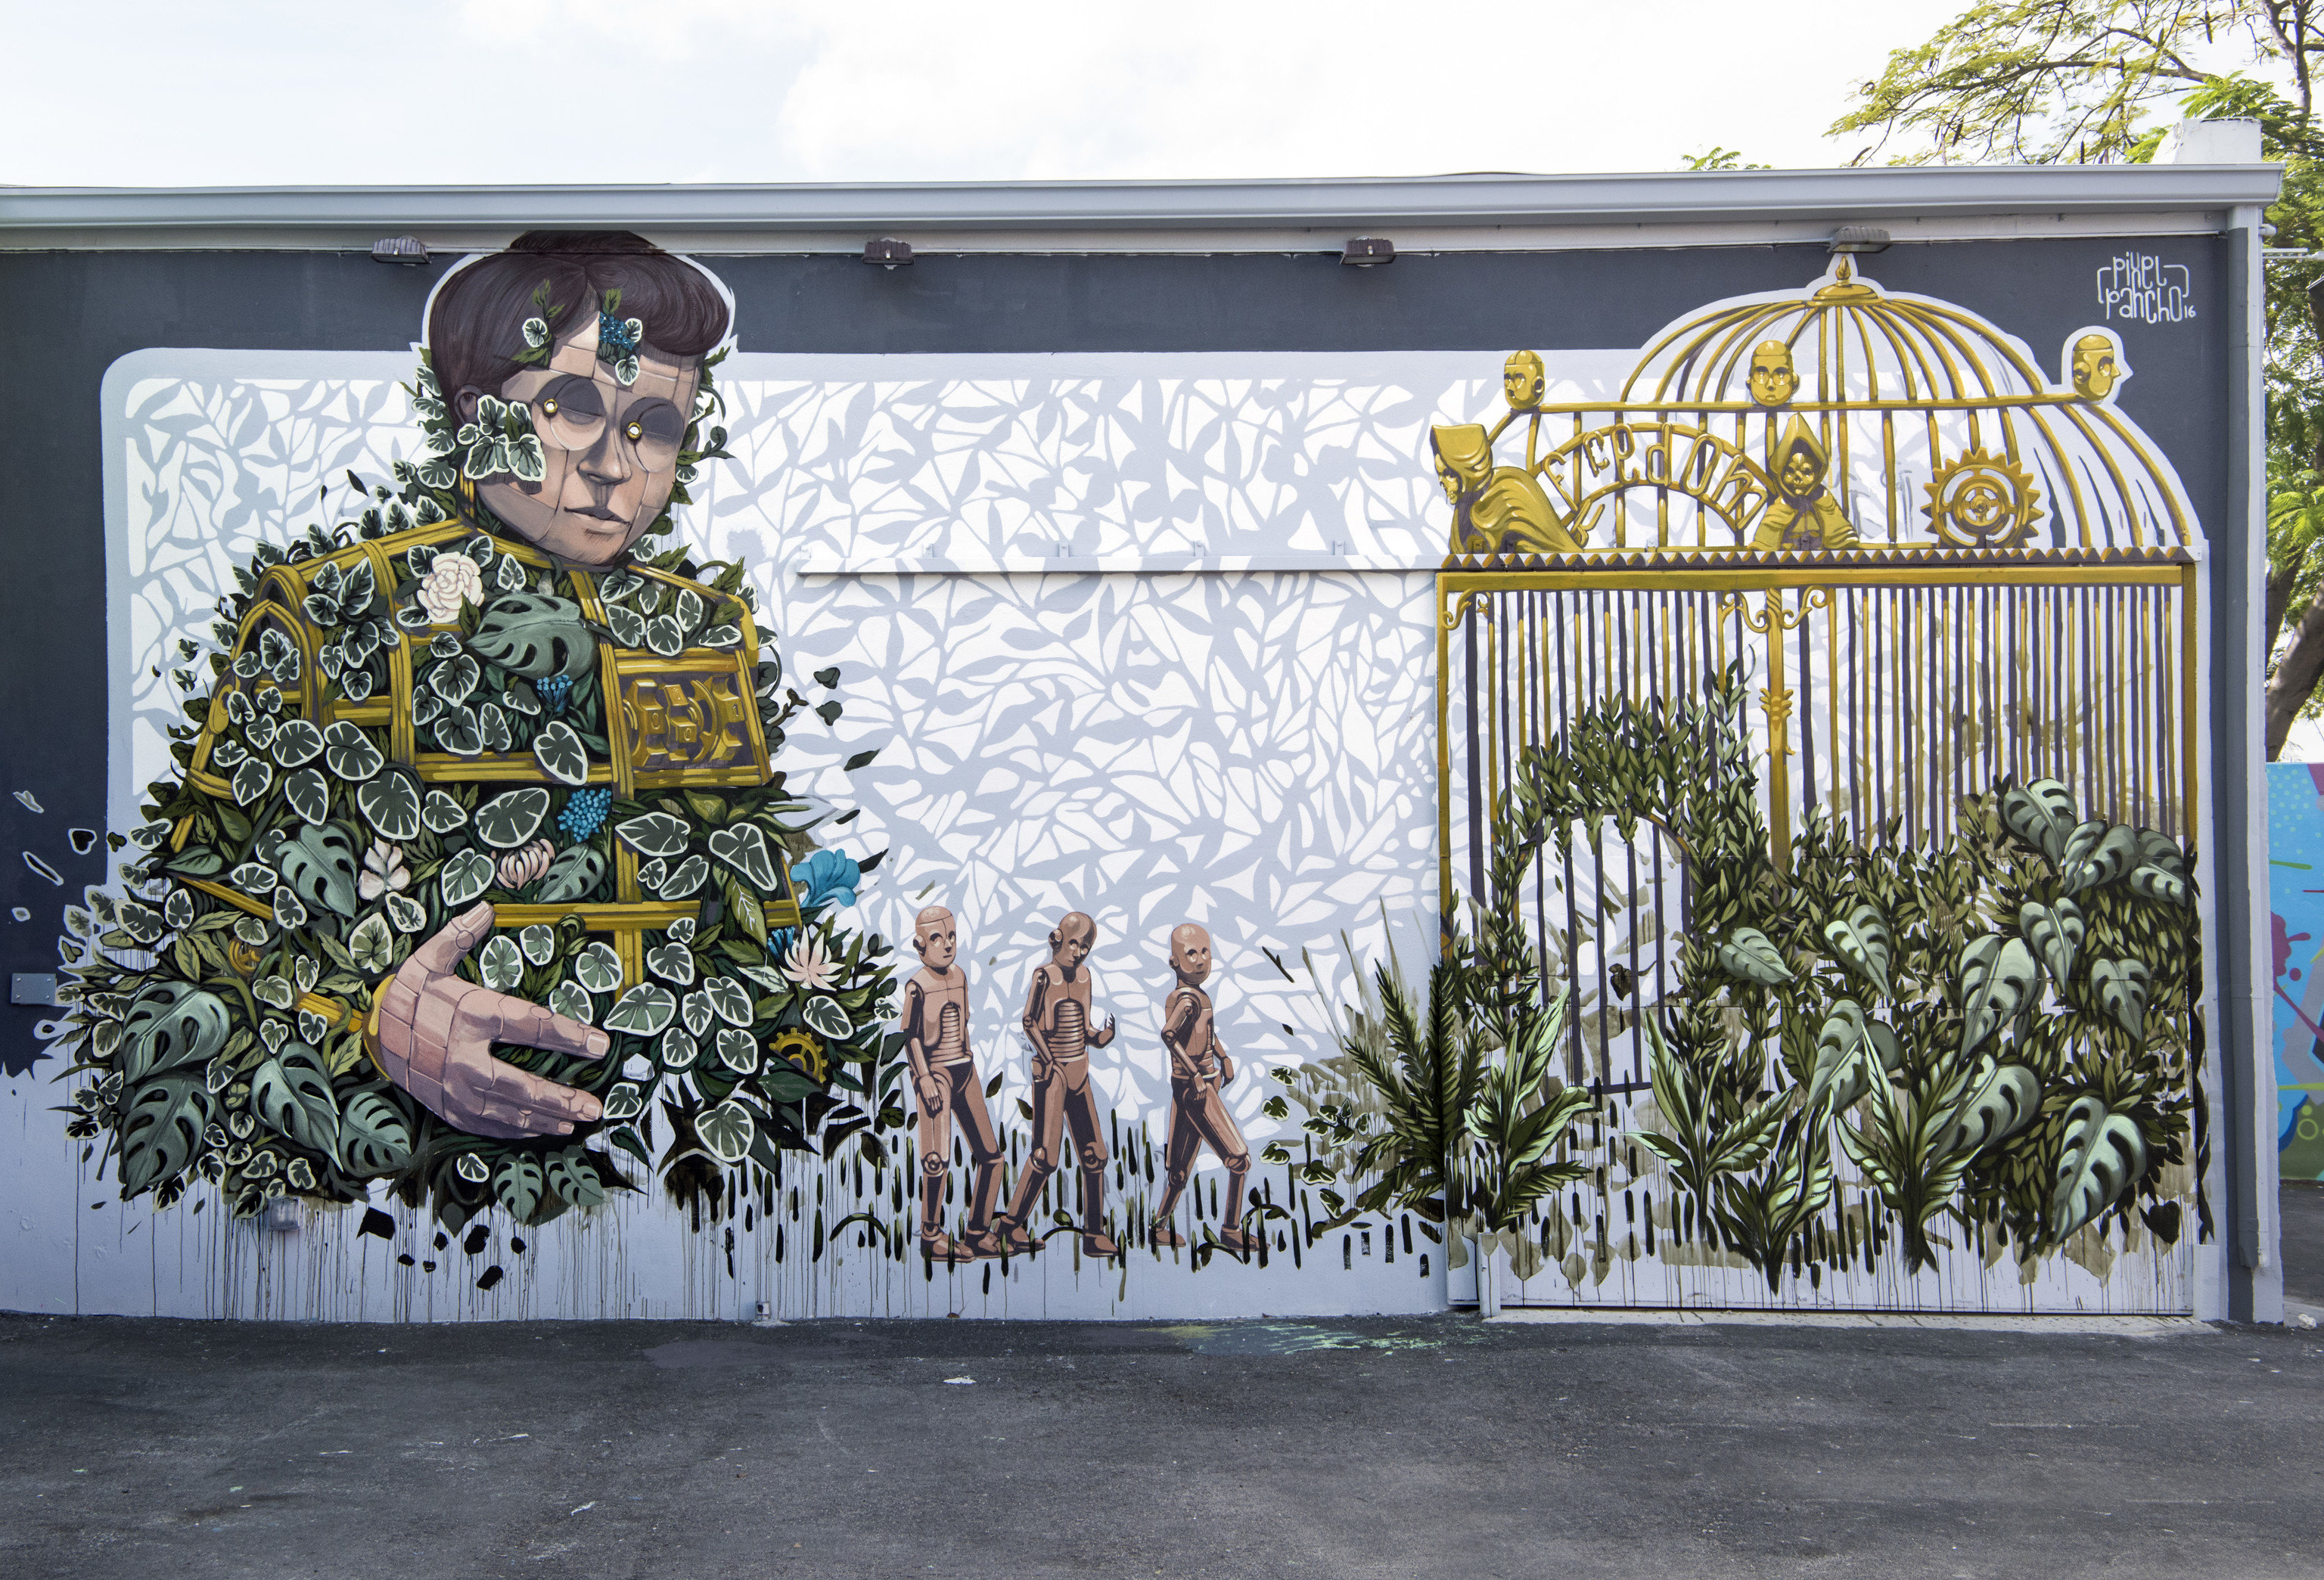 Trip Ideas outdoor person mural wall art gate